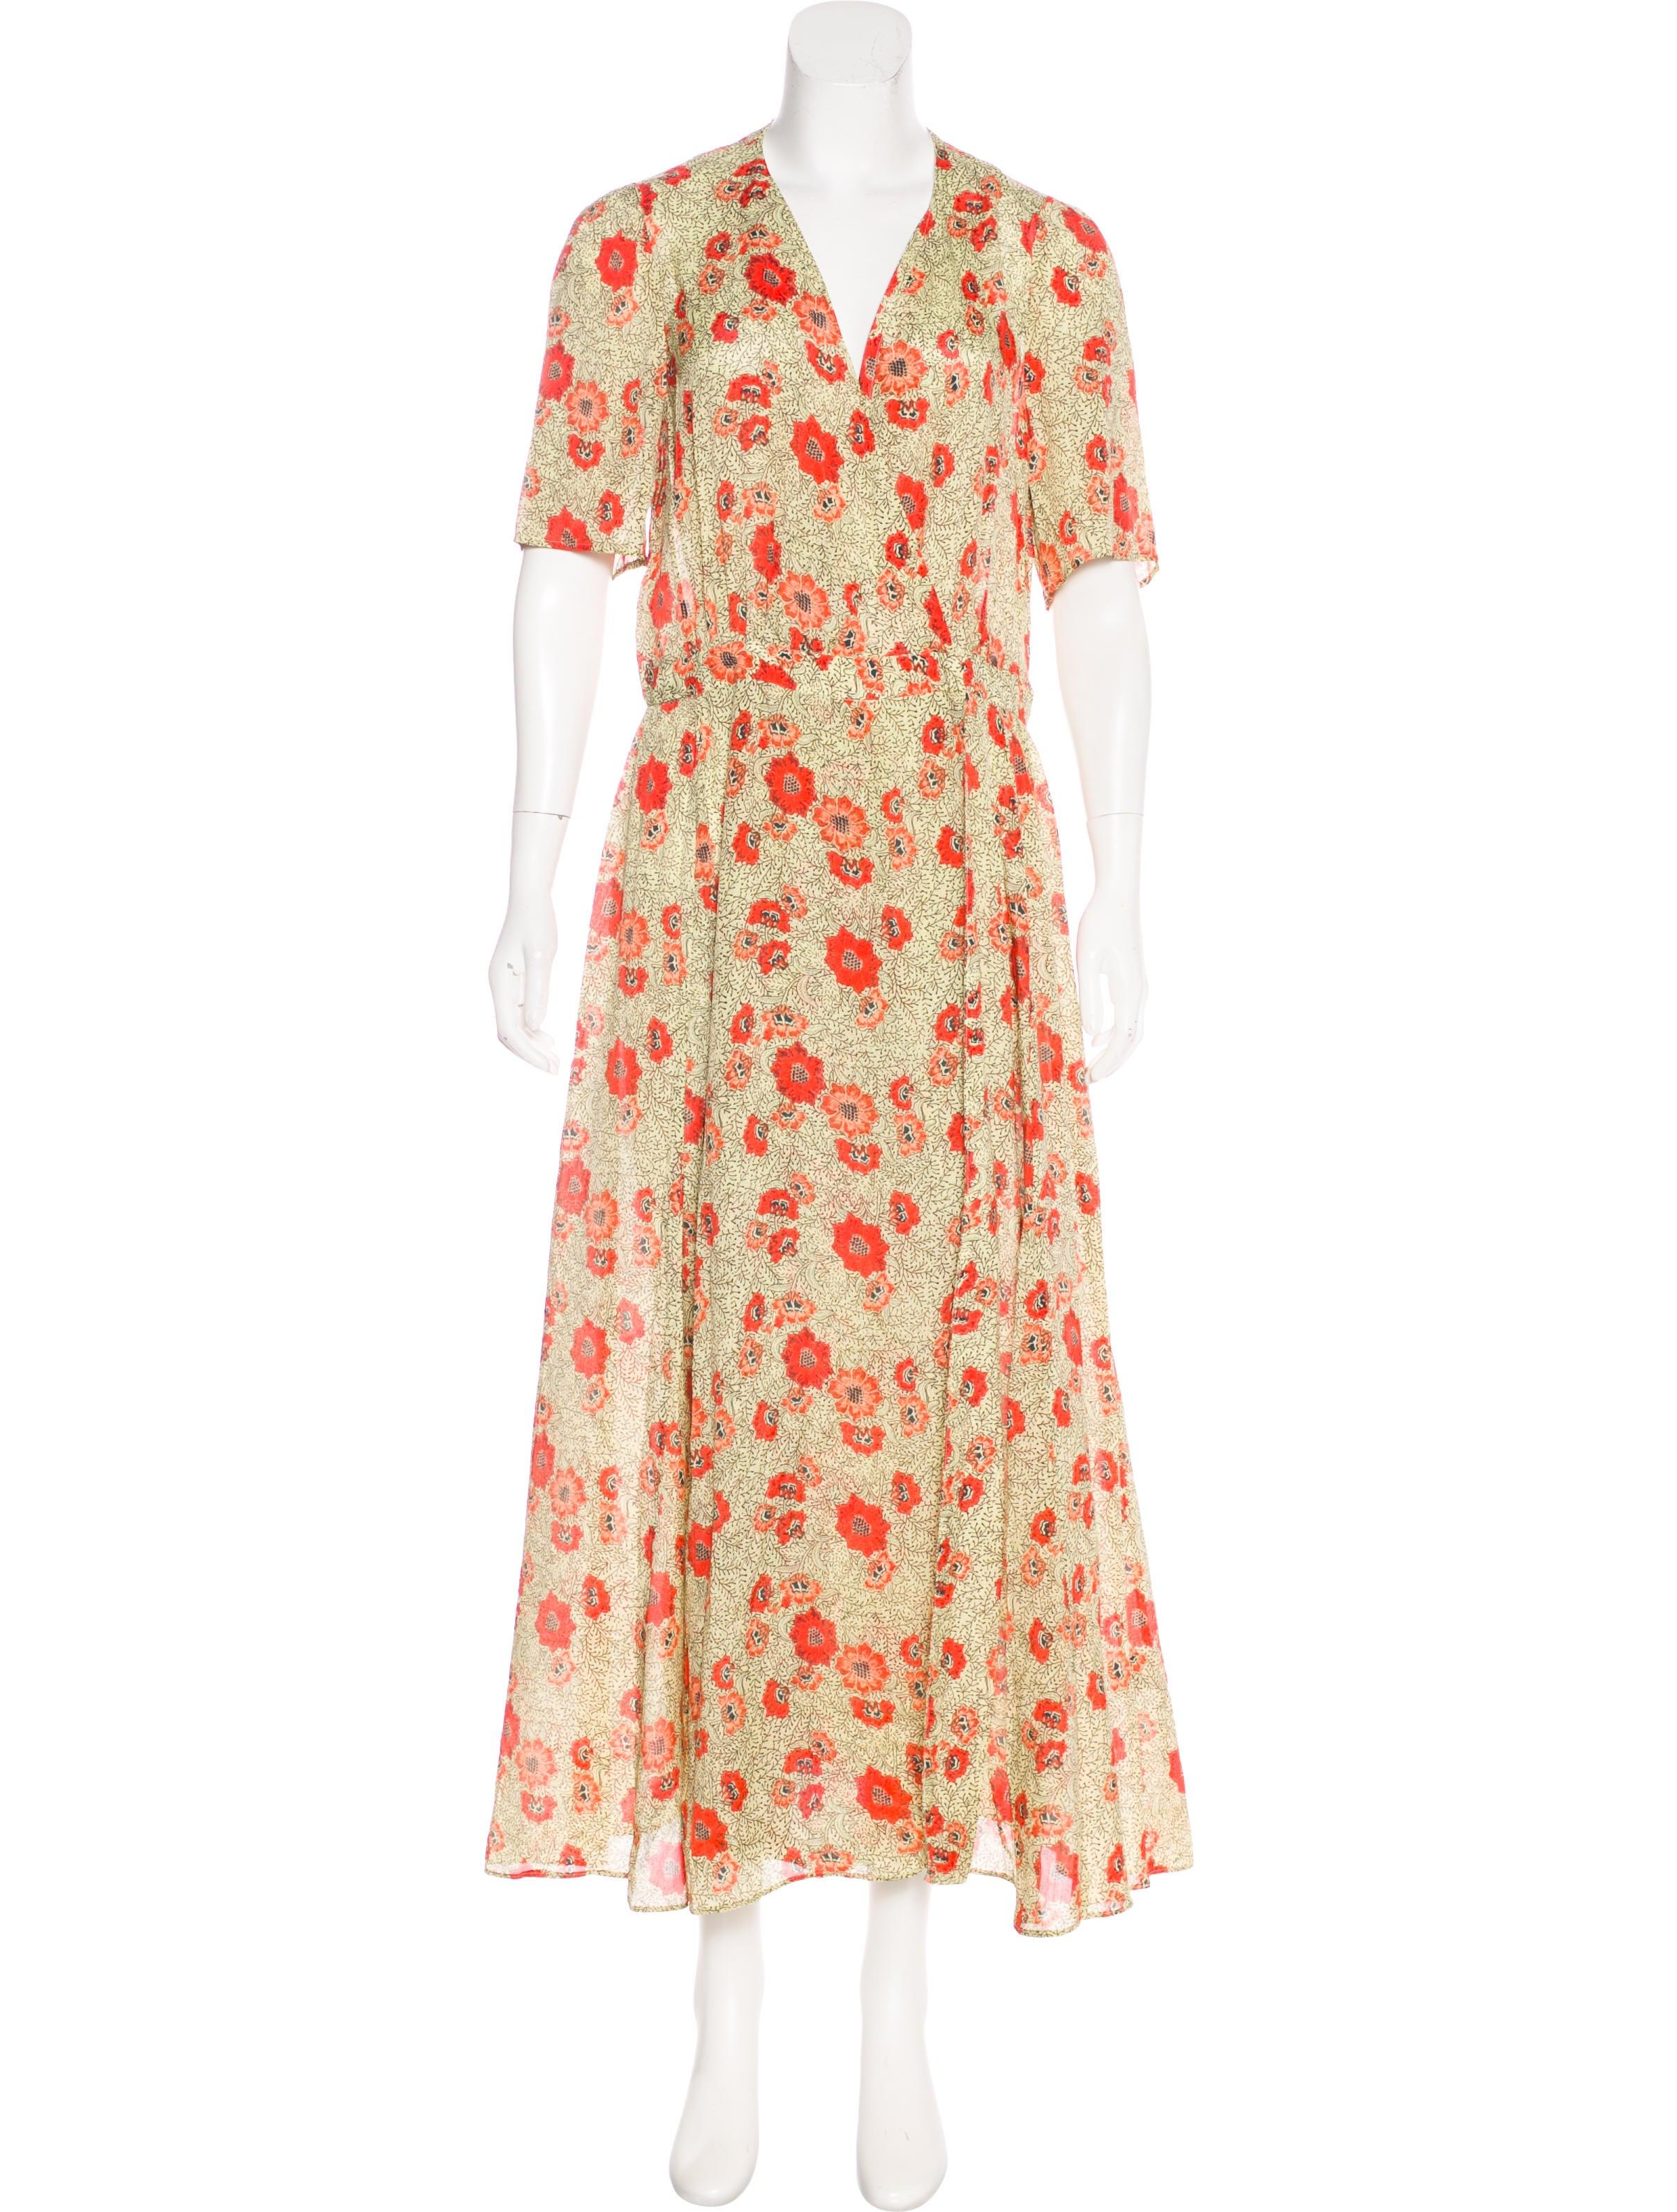 507f9dd00 Étoile Isabel Marant Floral Maxi Dress - Clothing - WET48634 | The ...